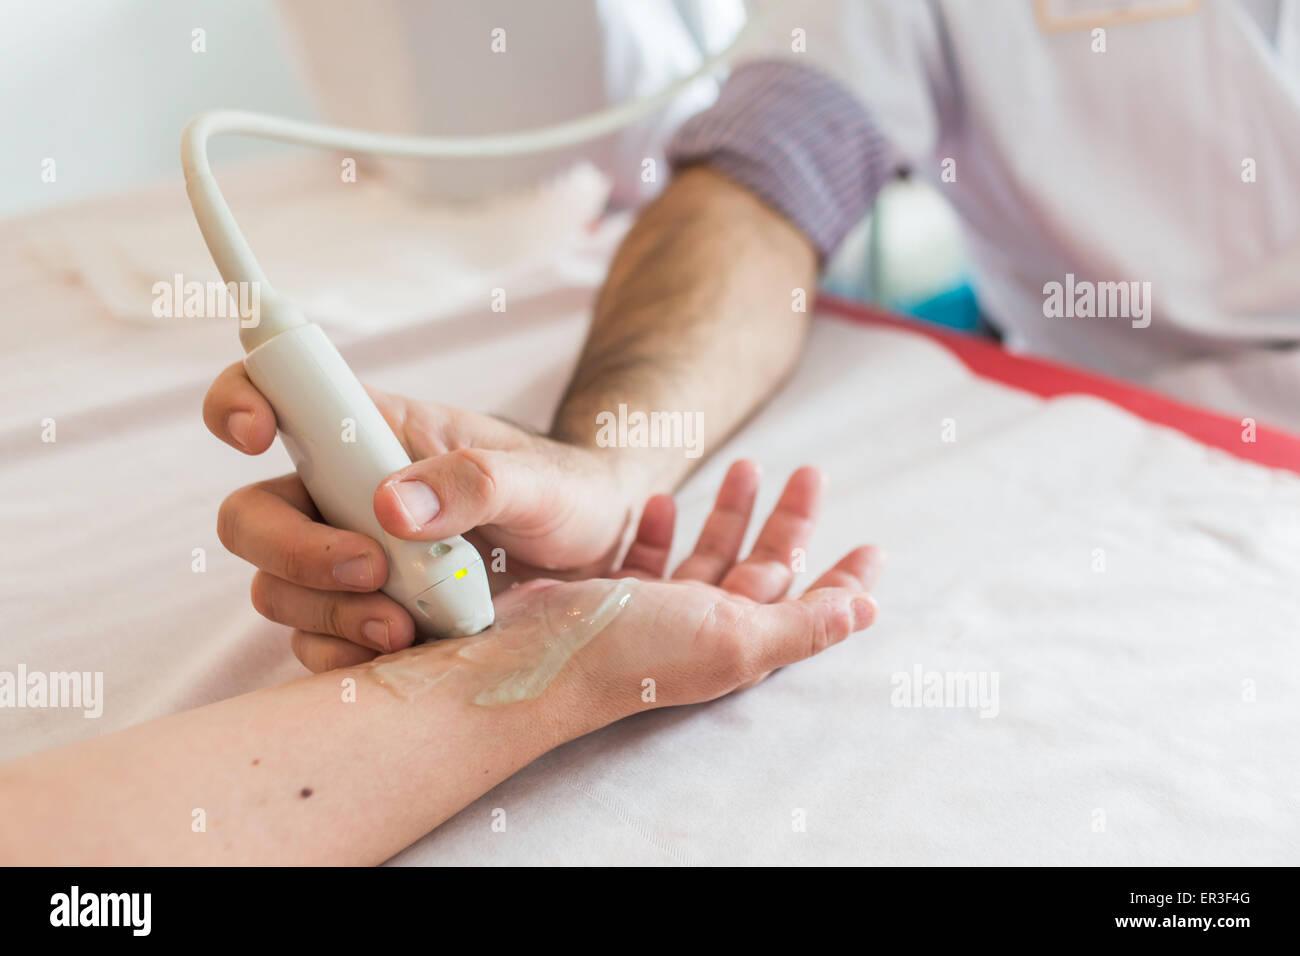 Ultrasound carpal tunnel by a rheumatologist. - Stock Image